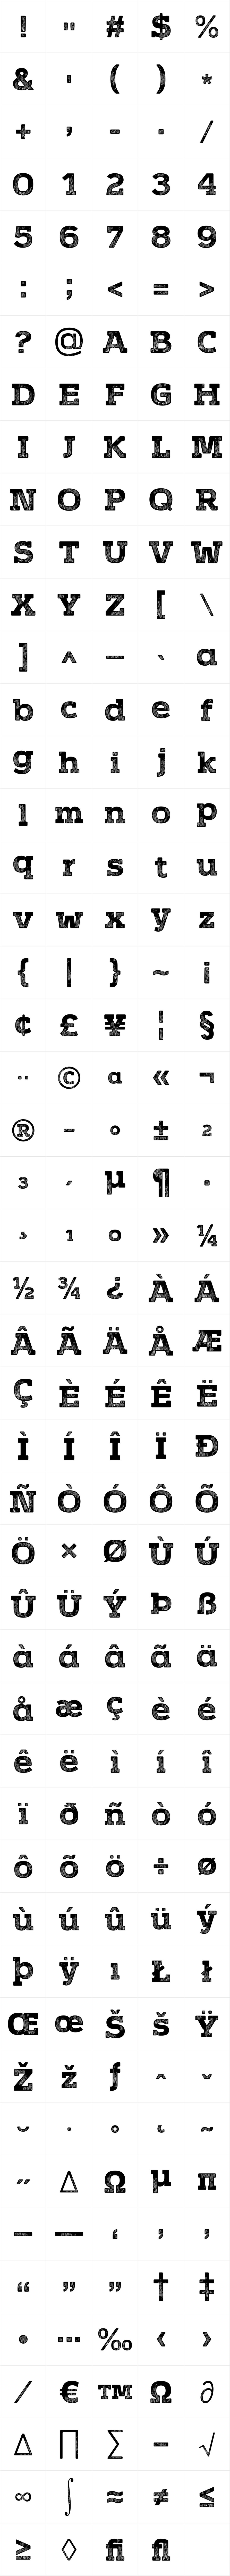 Vezus Serif Texture One